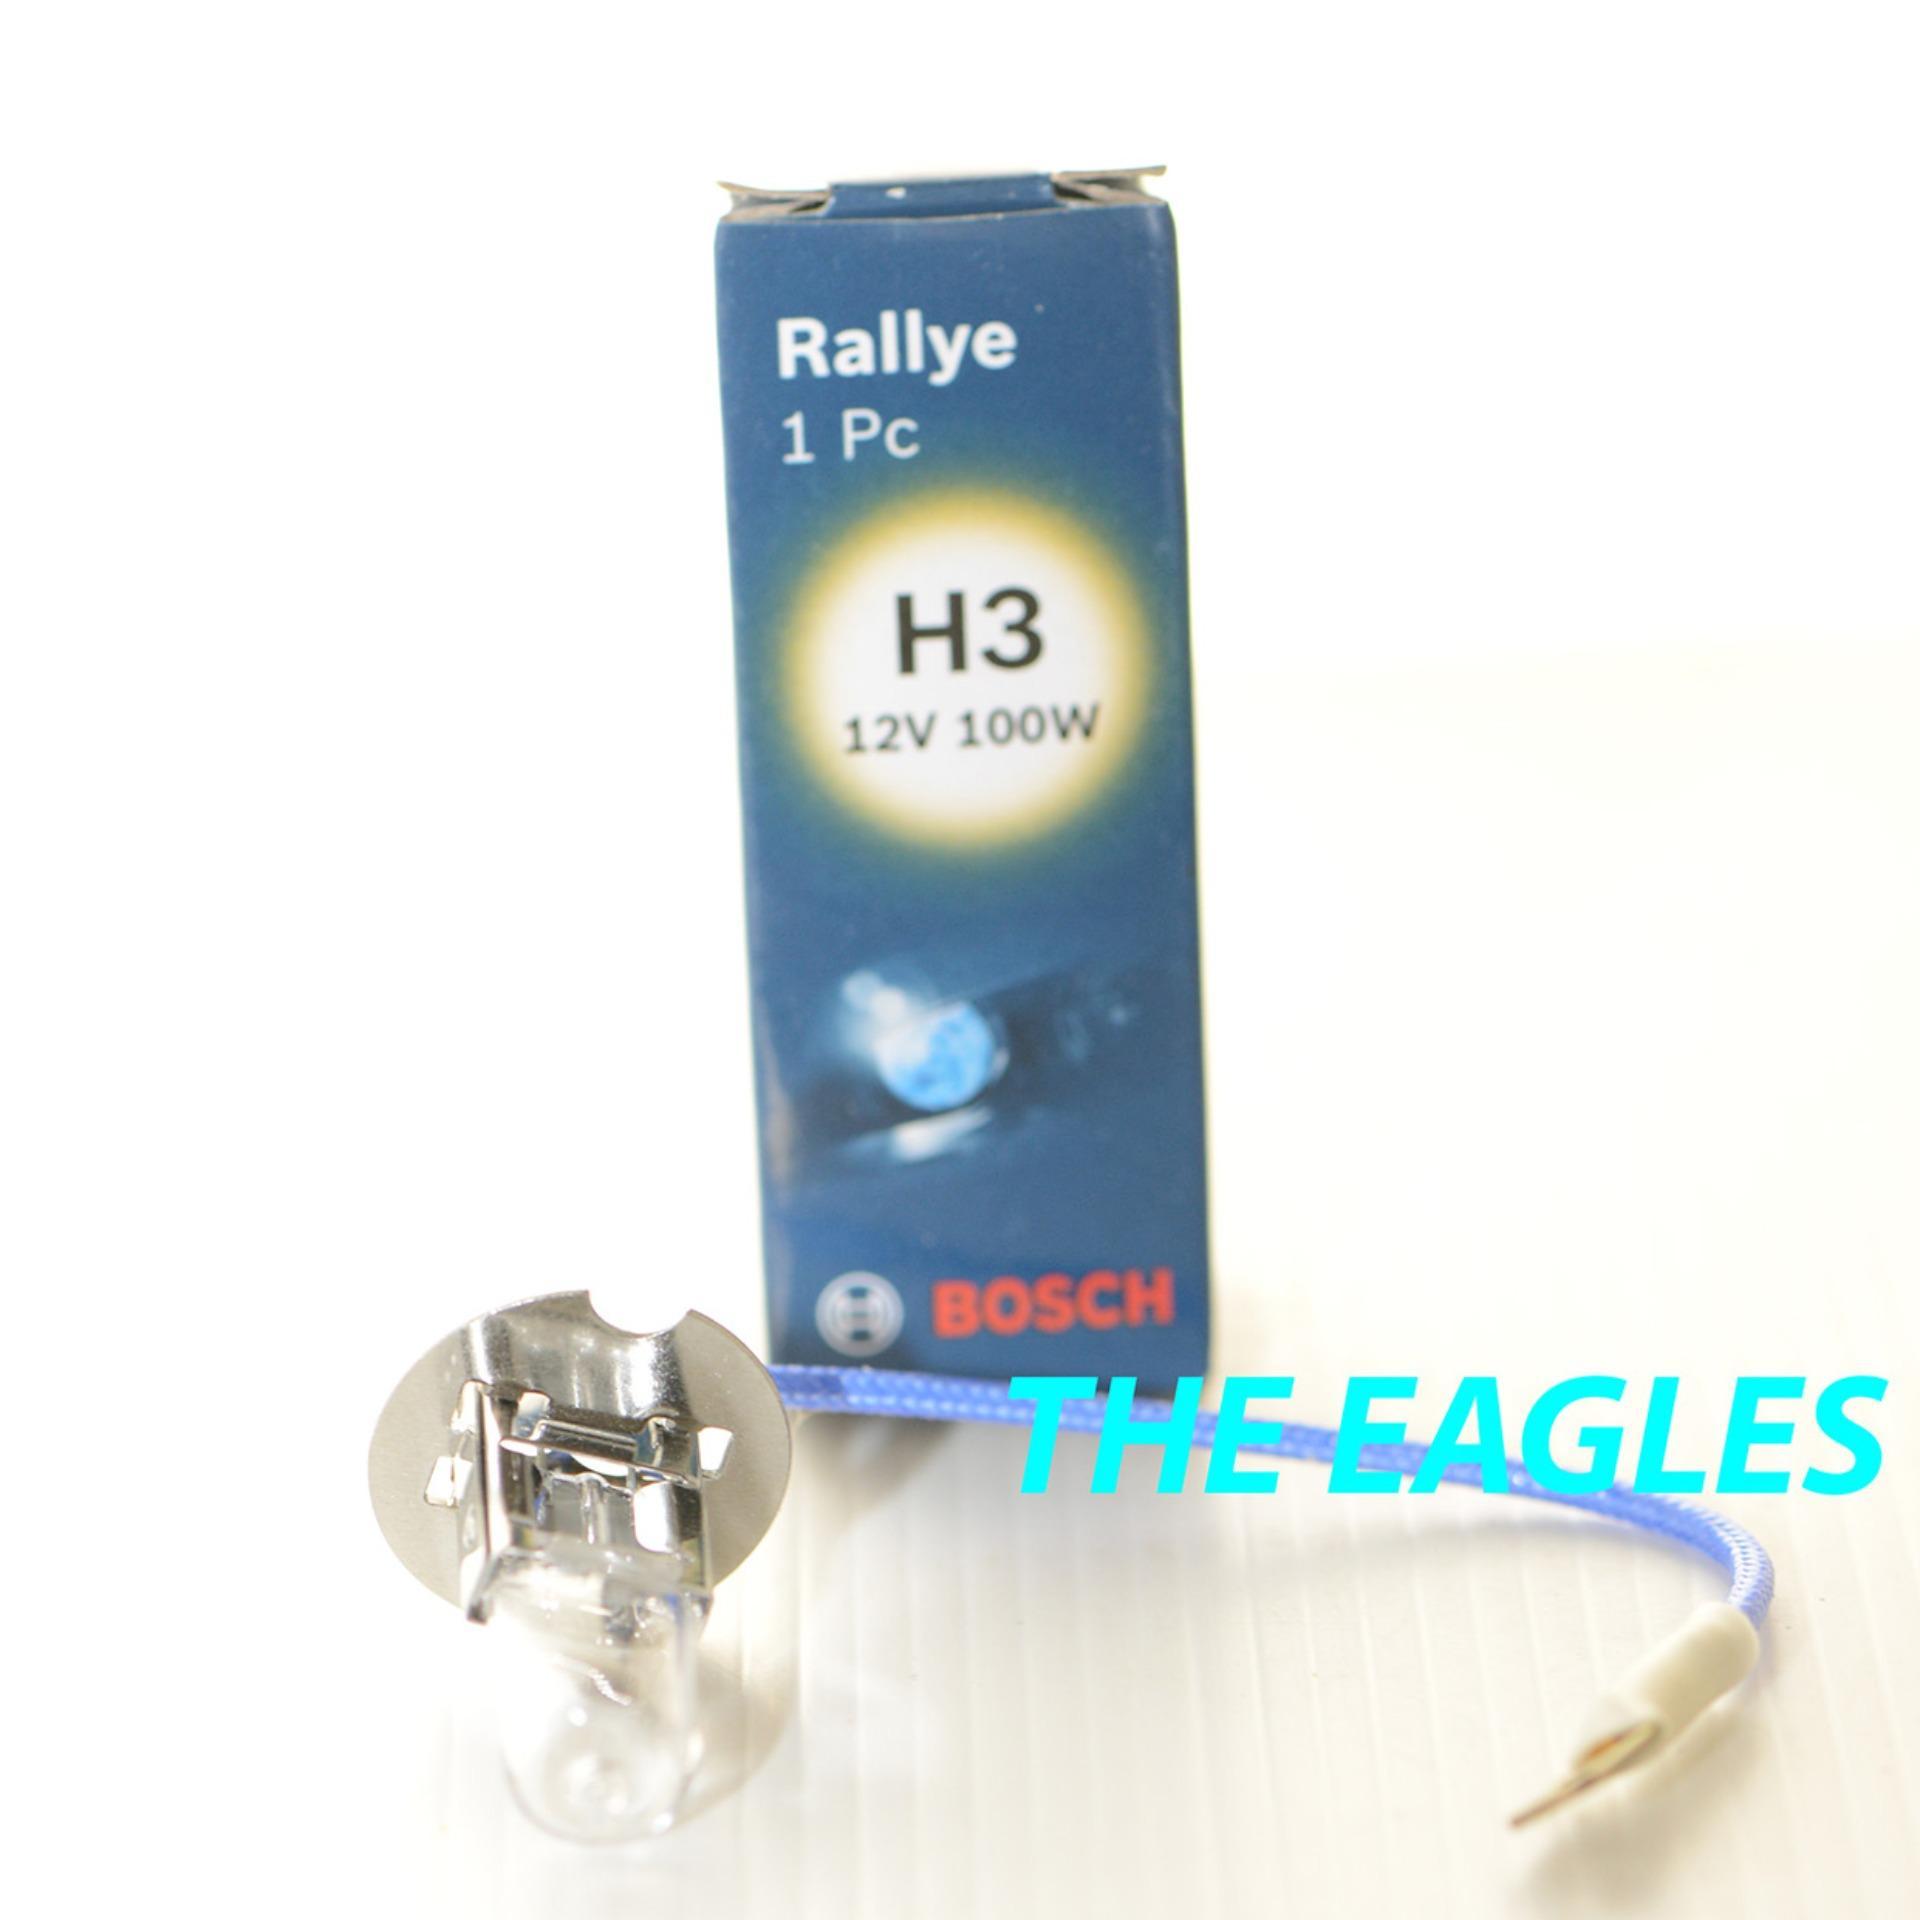 Rallye BOSCH bulb bohlam lamp lampu light H3 100 W 100W 24V